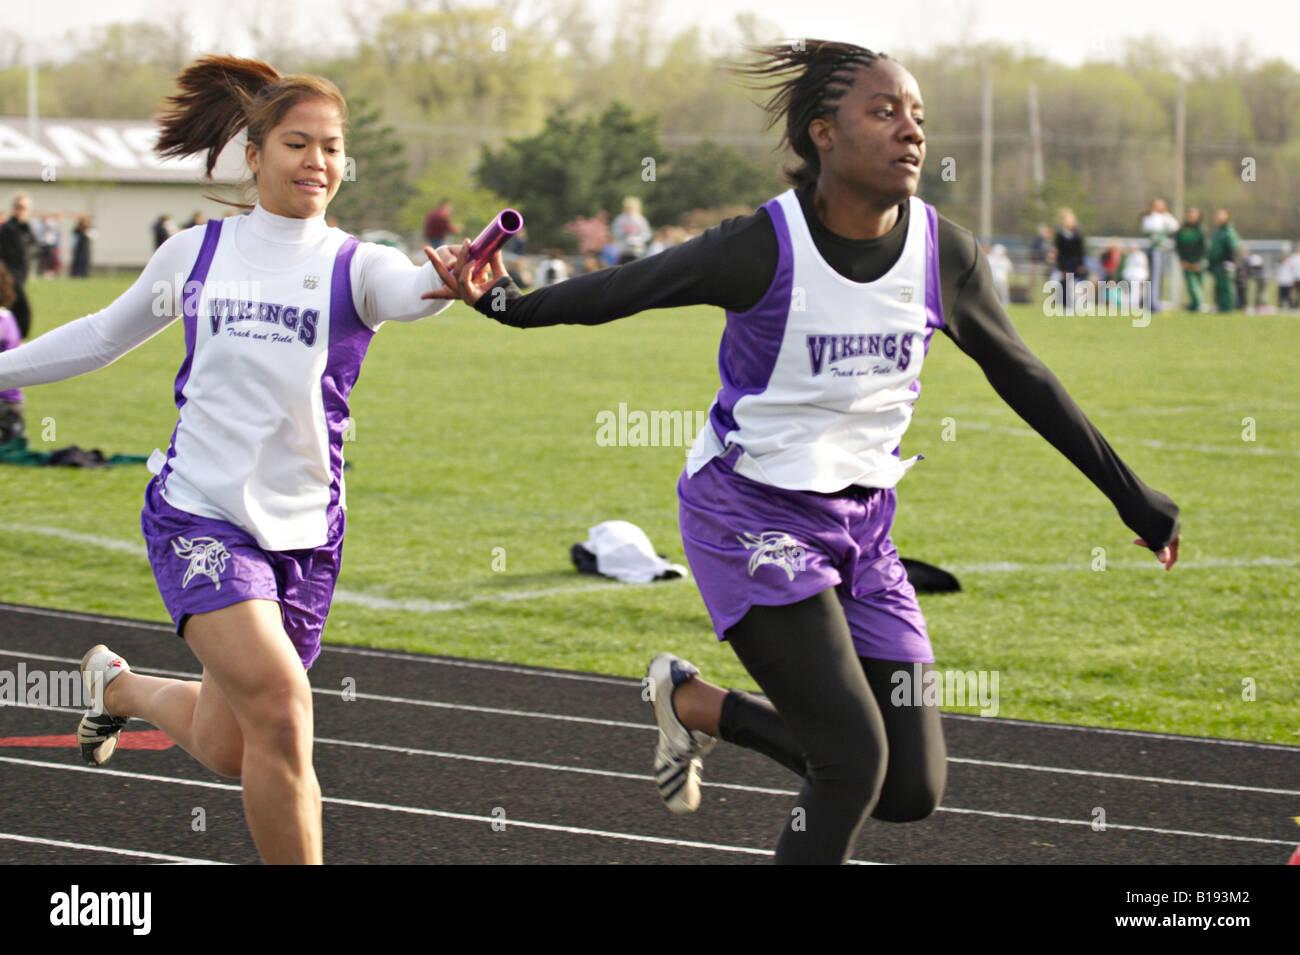 TRACK Glenview Illinois Sprint relay two female runners exchange baton high school girls track meet - Stock Image